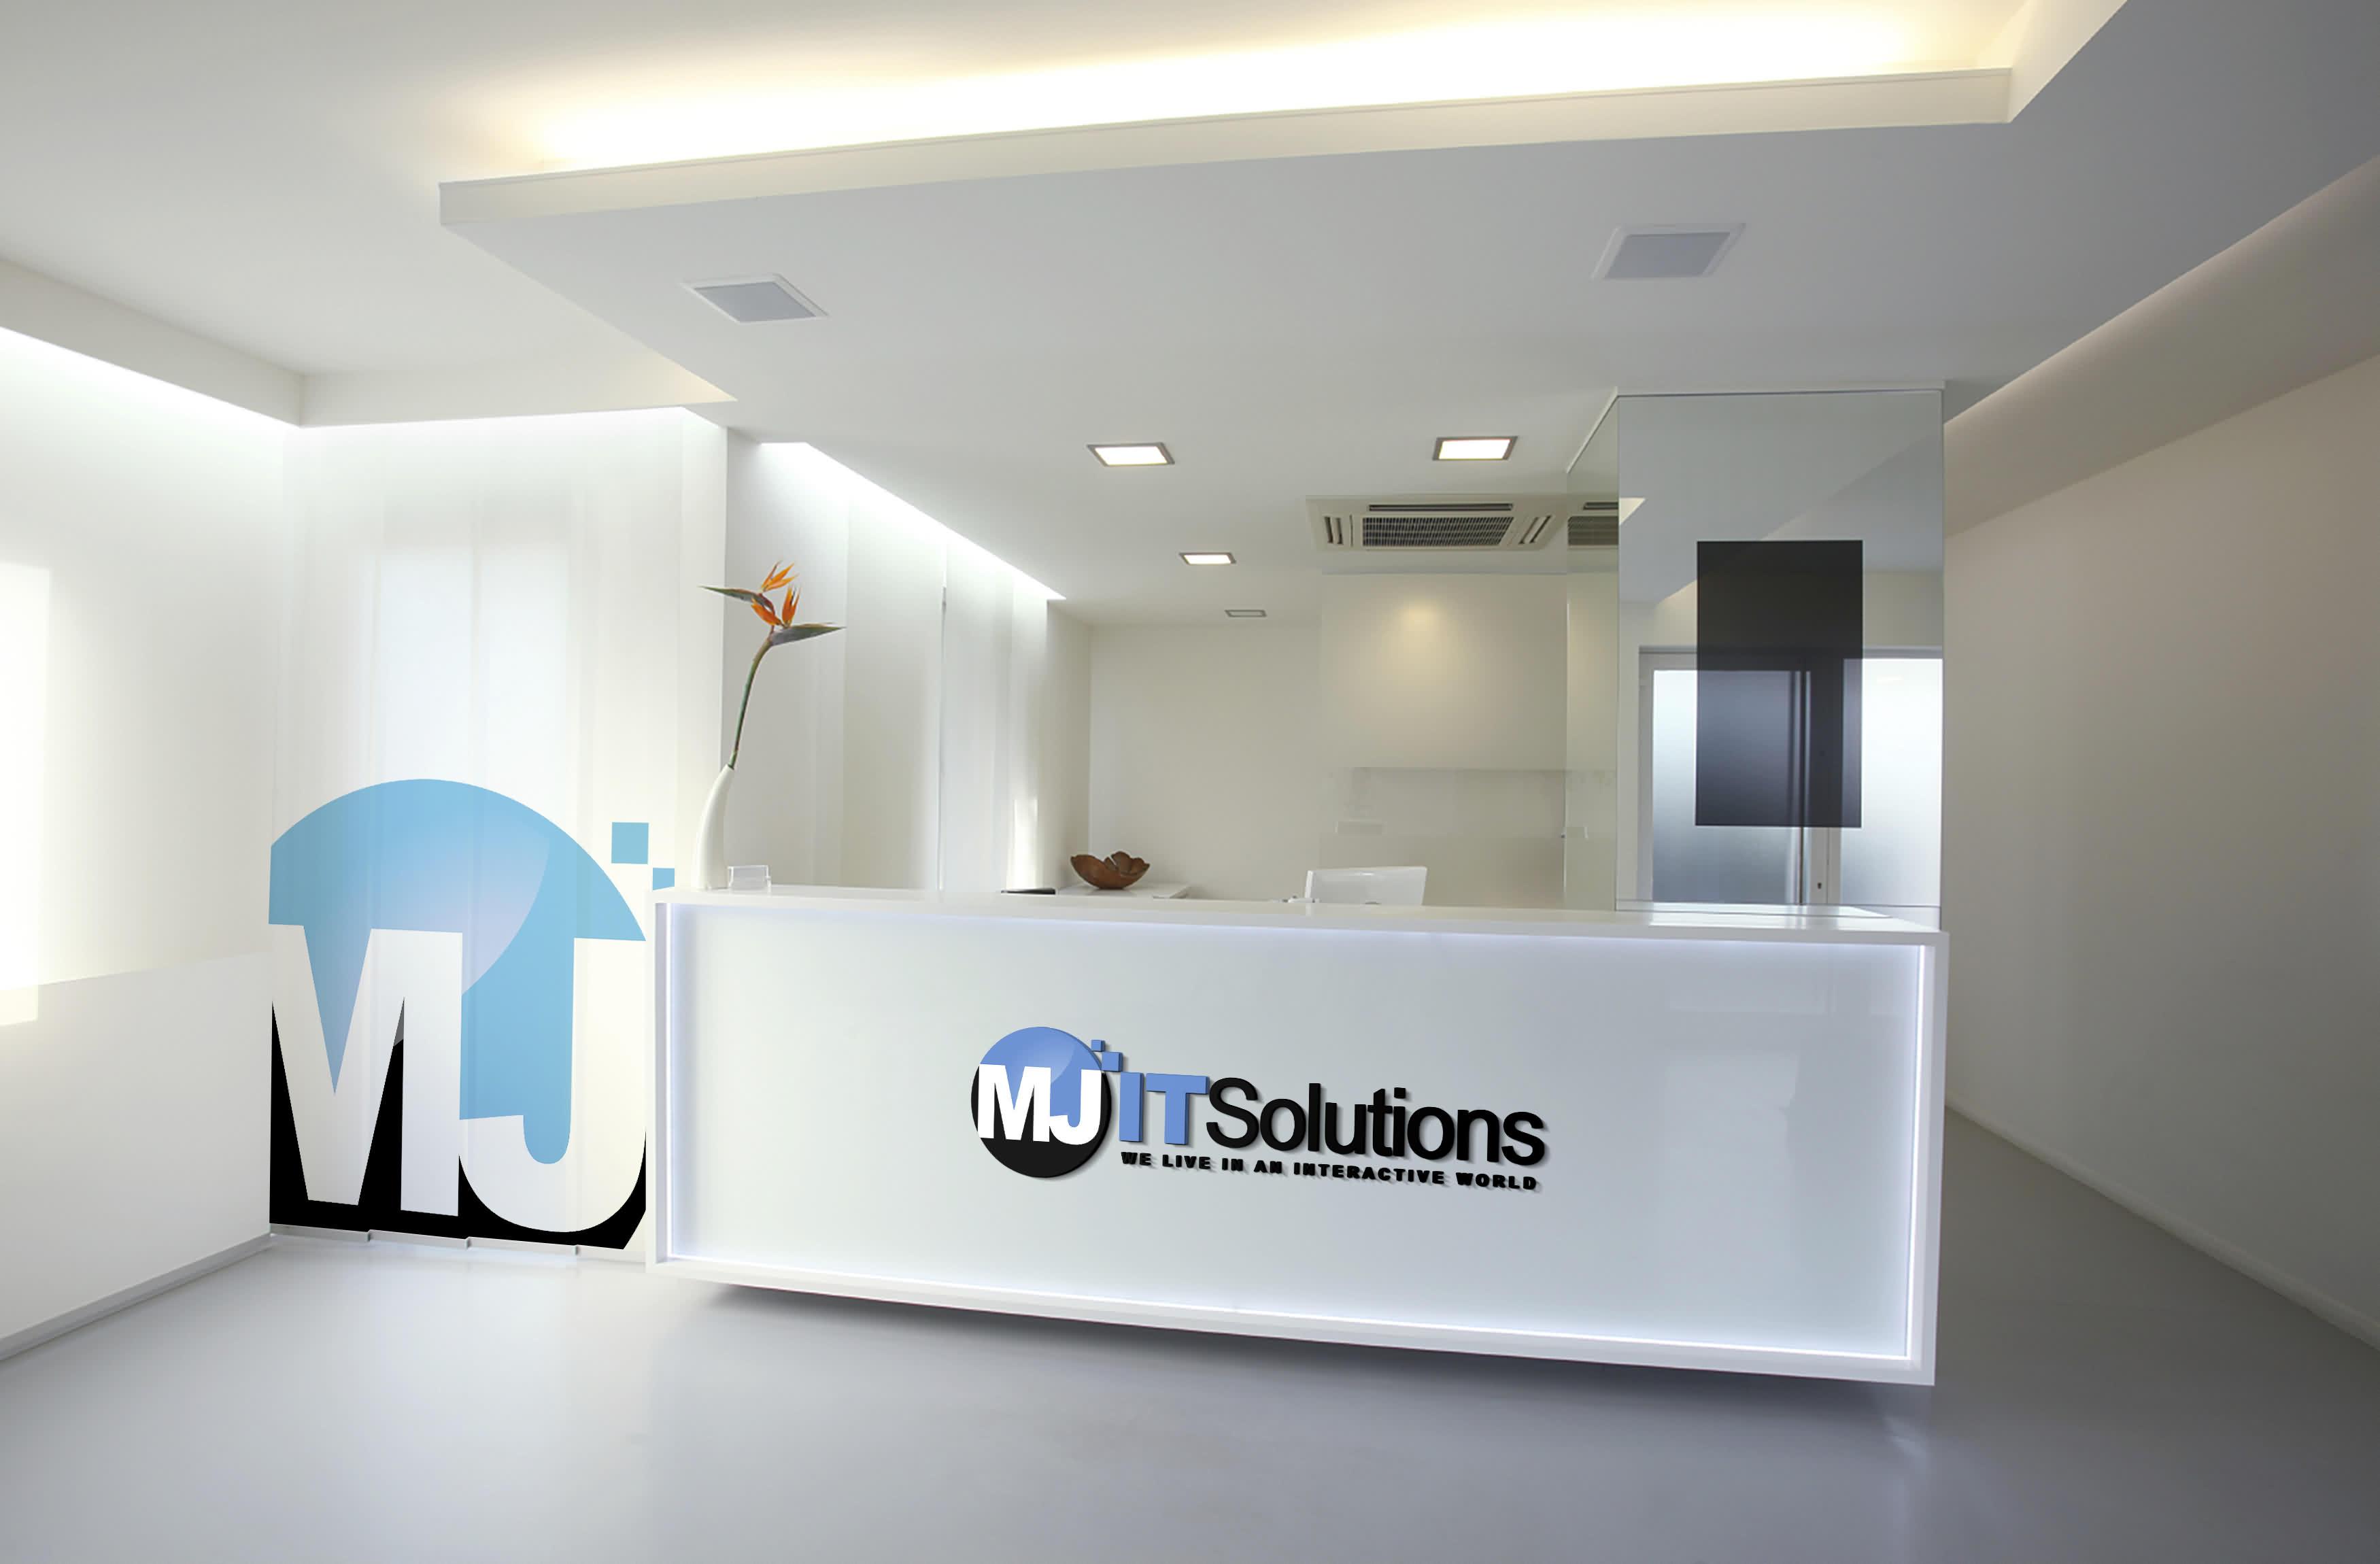 Mj it office west door entrance for Office door entrance designs